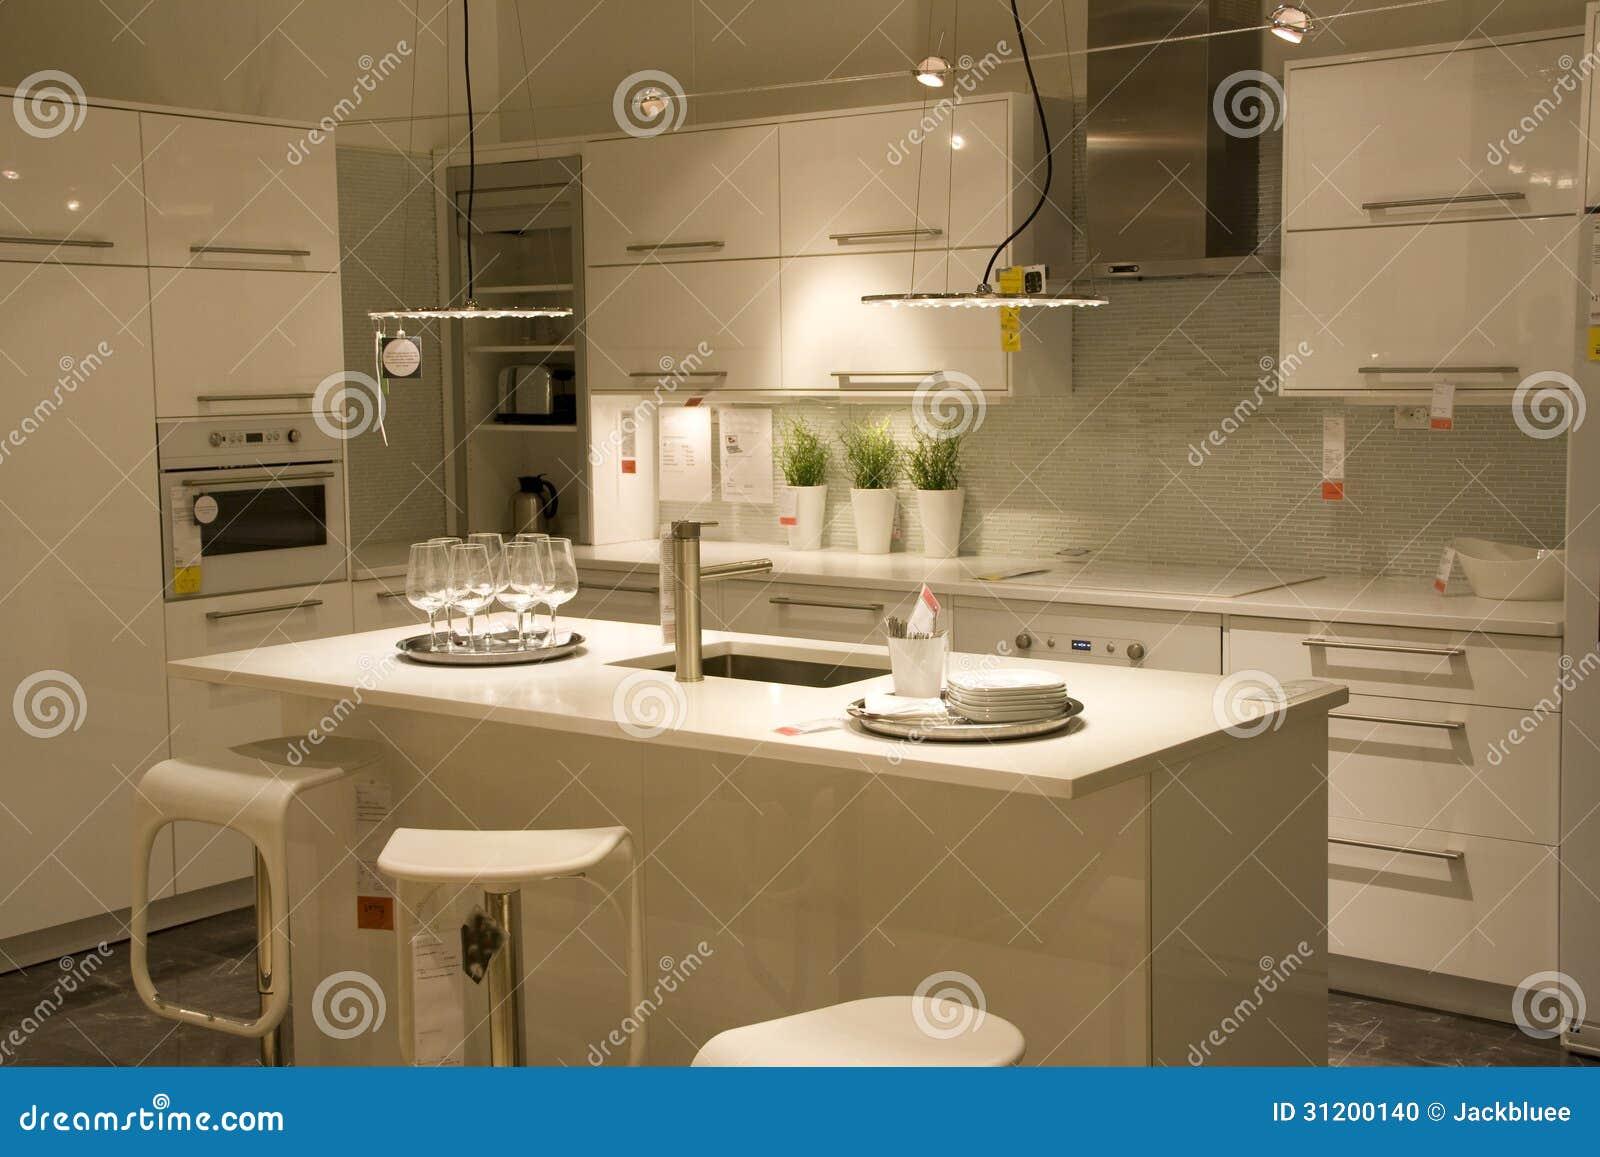 Dise o de interiores moderno de la cocina foto de archivo for Diseno interiores